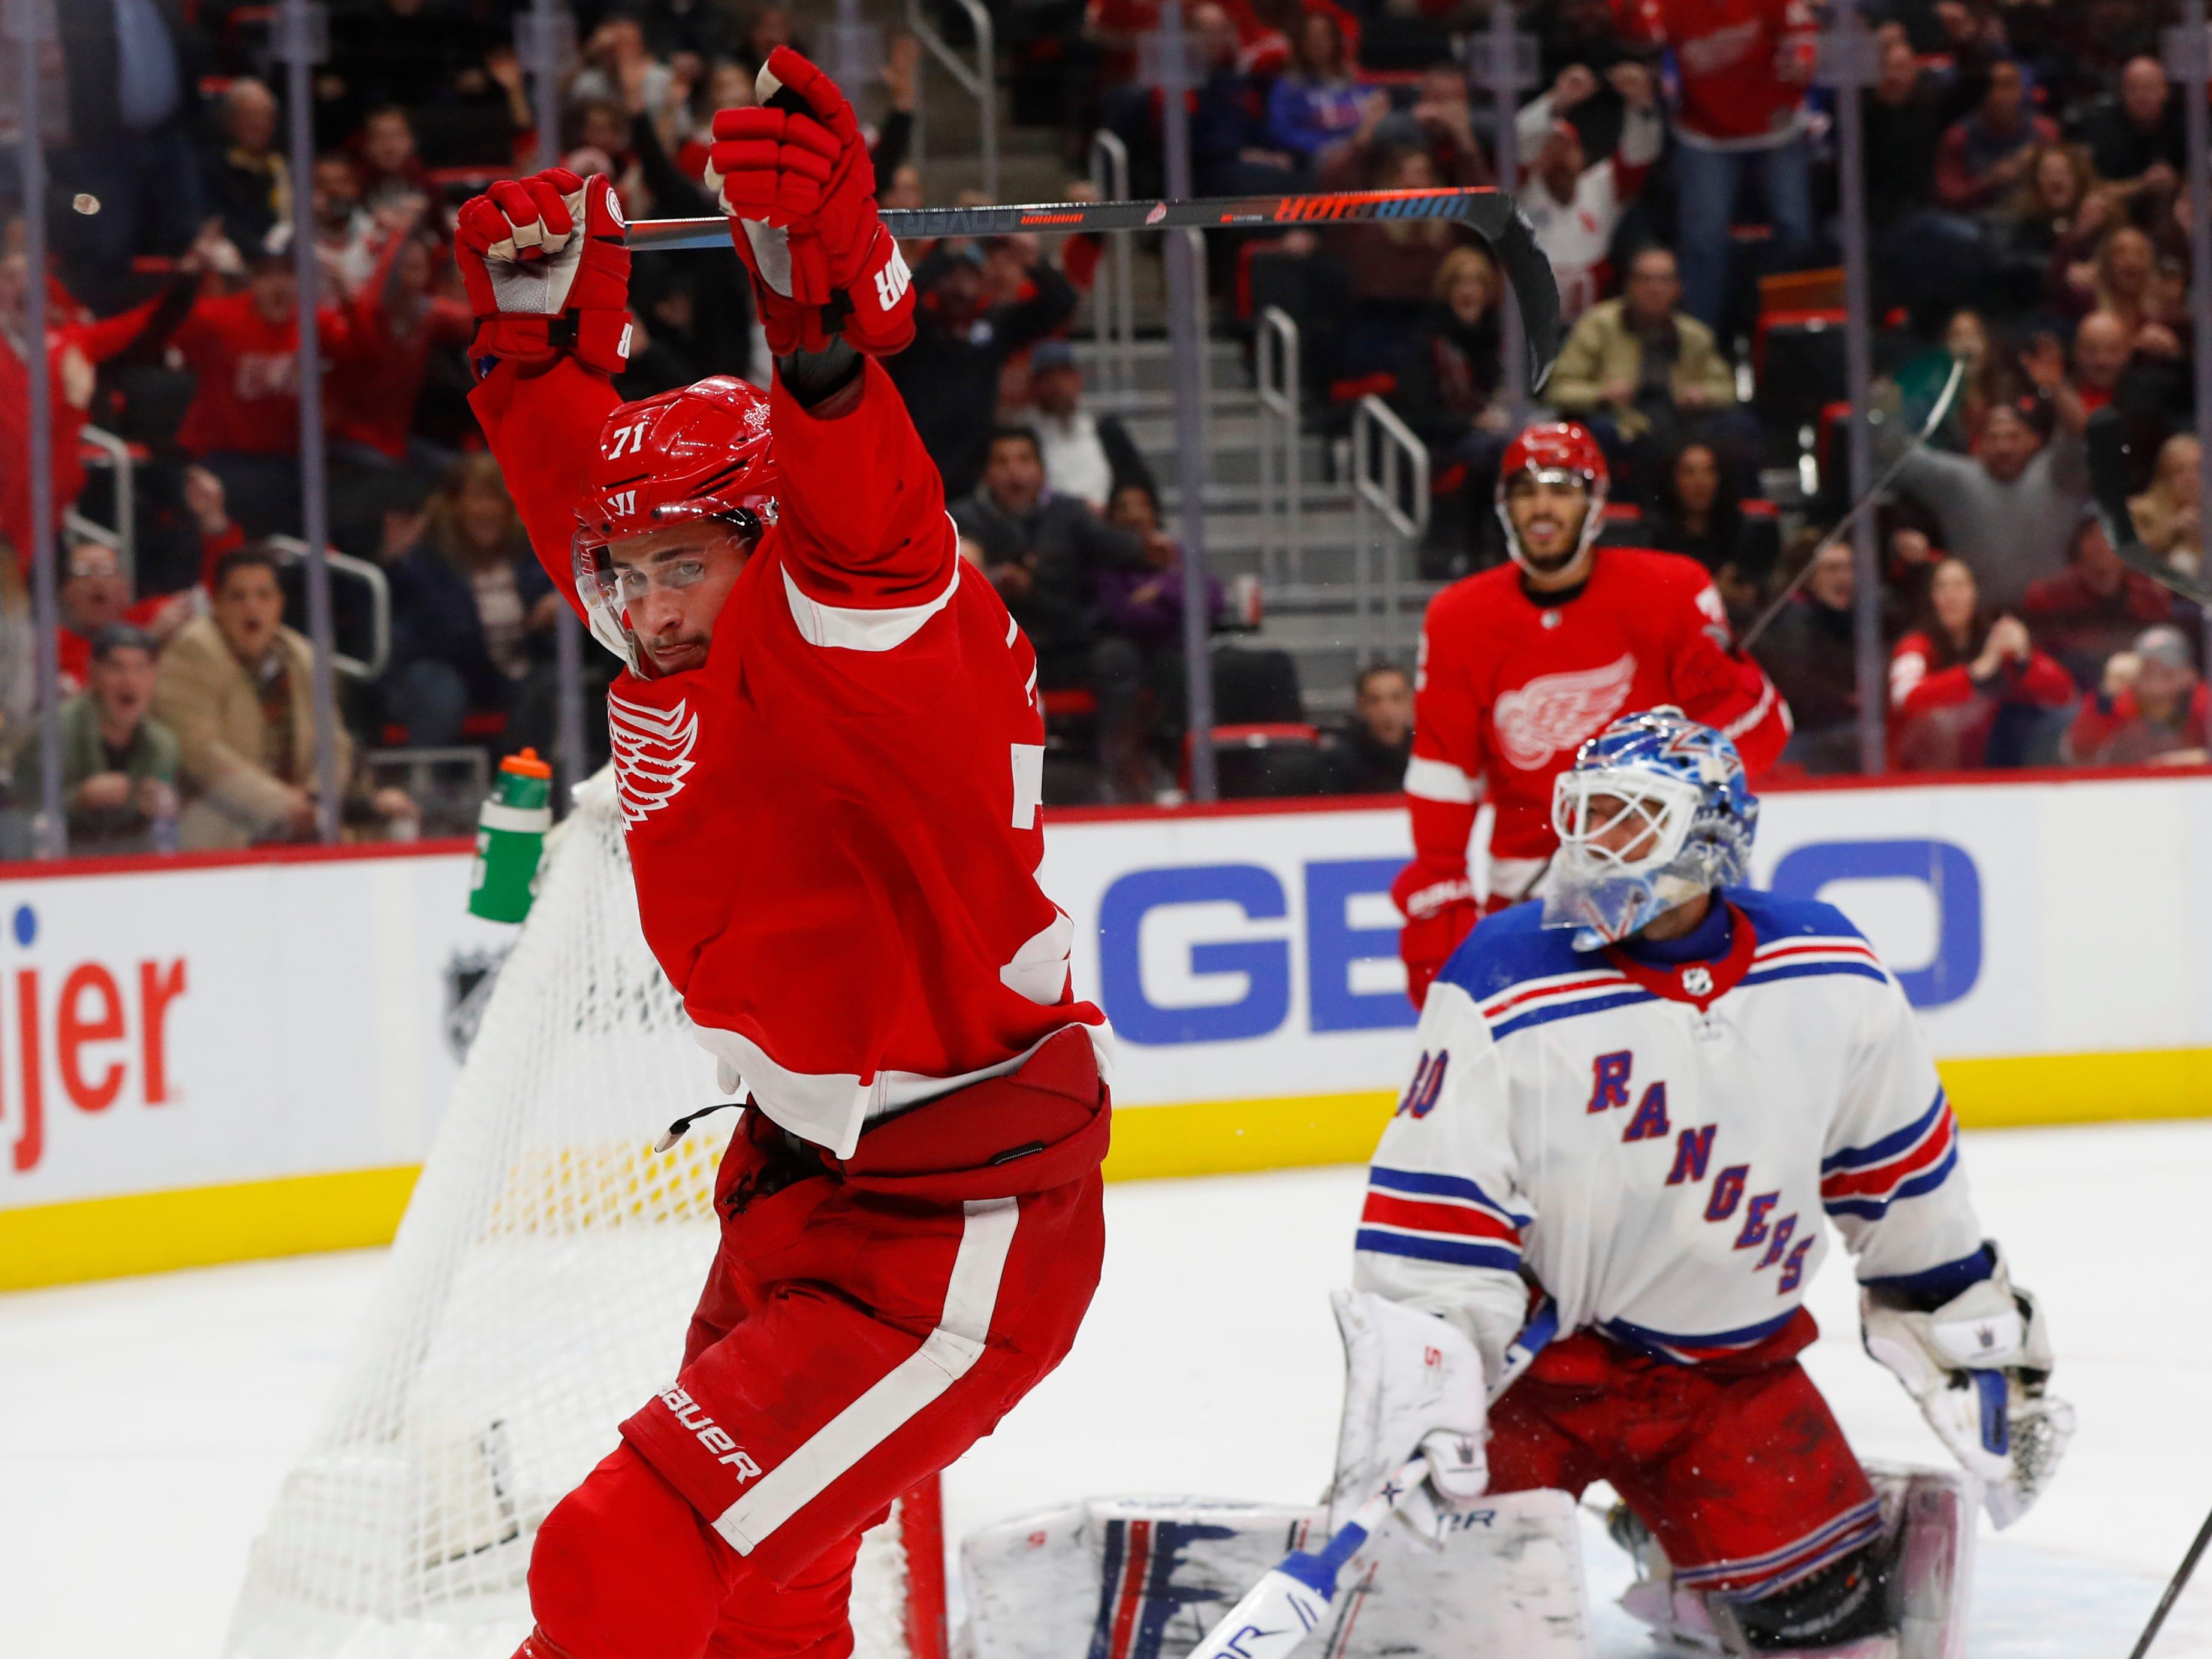 Detroit Red Wings' Dylan Larkin celebrates his goal against the New York Rangers in overtime of an NHL hockey game in Detroit, Friday, Nov. 9, 2018. Detroit won 3-2.